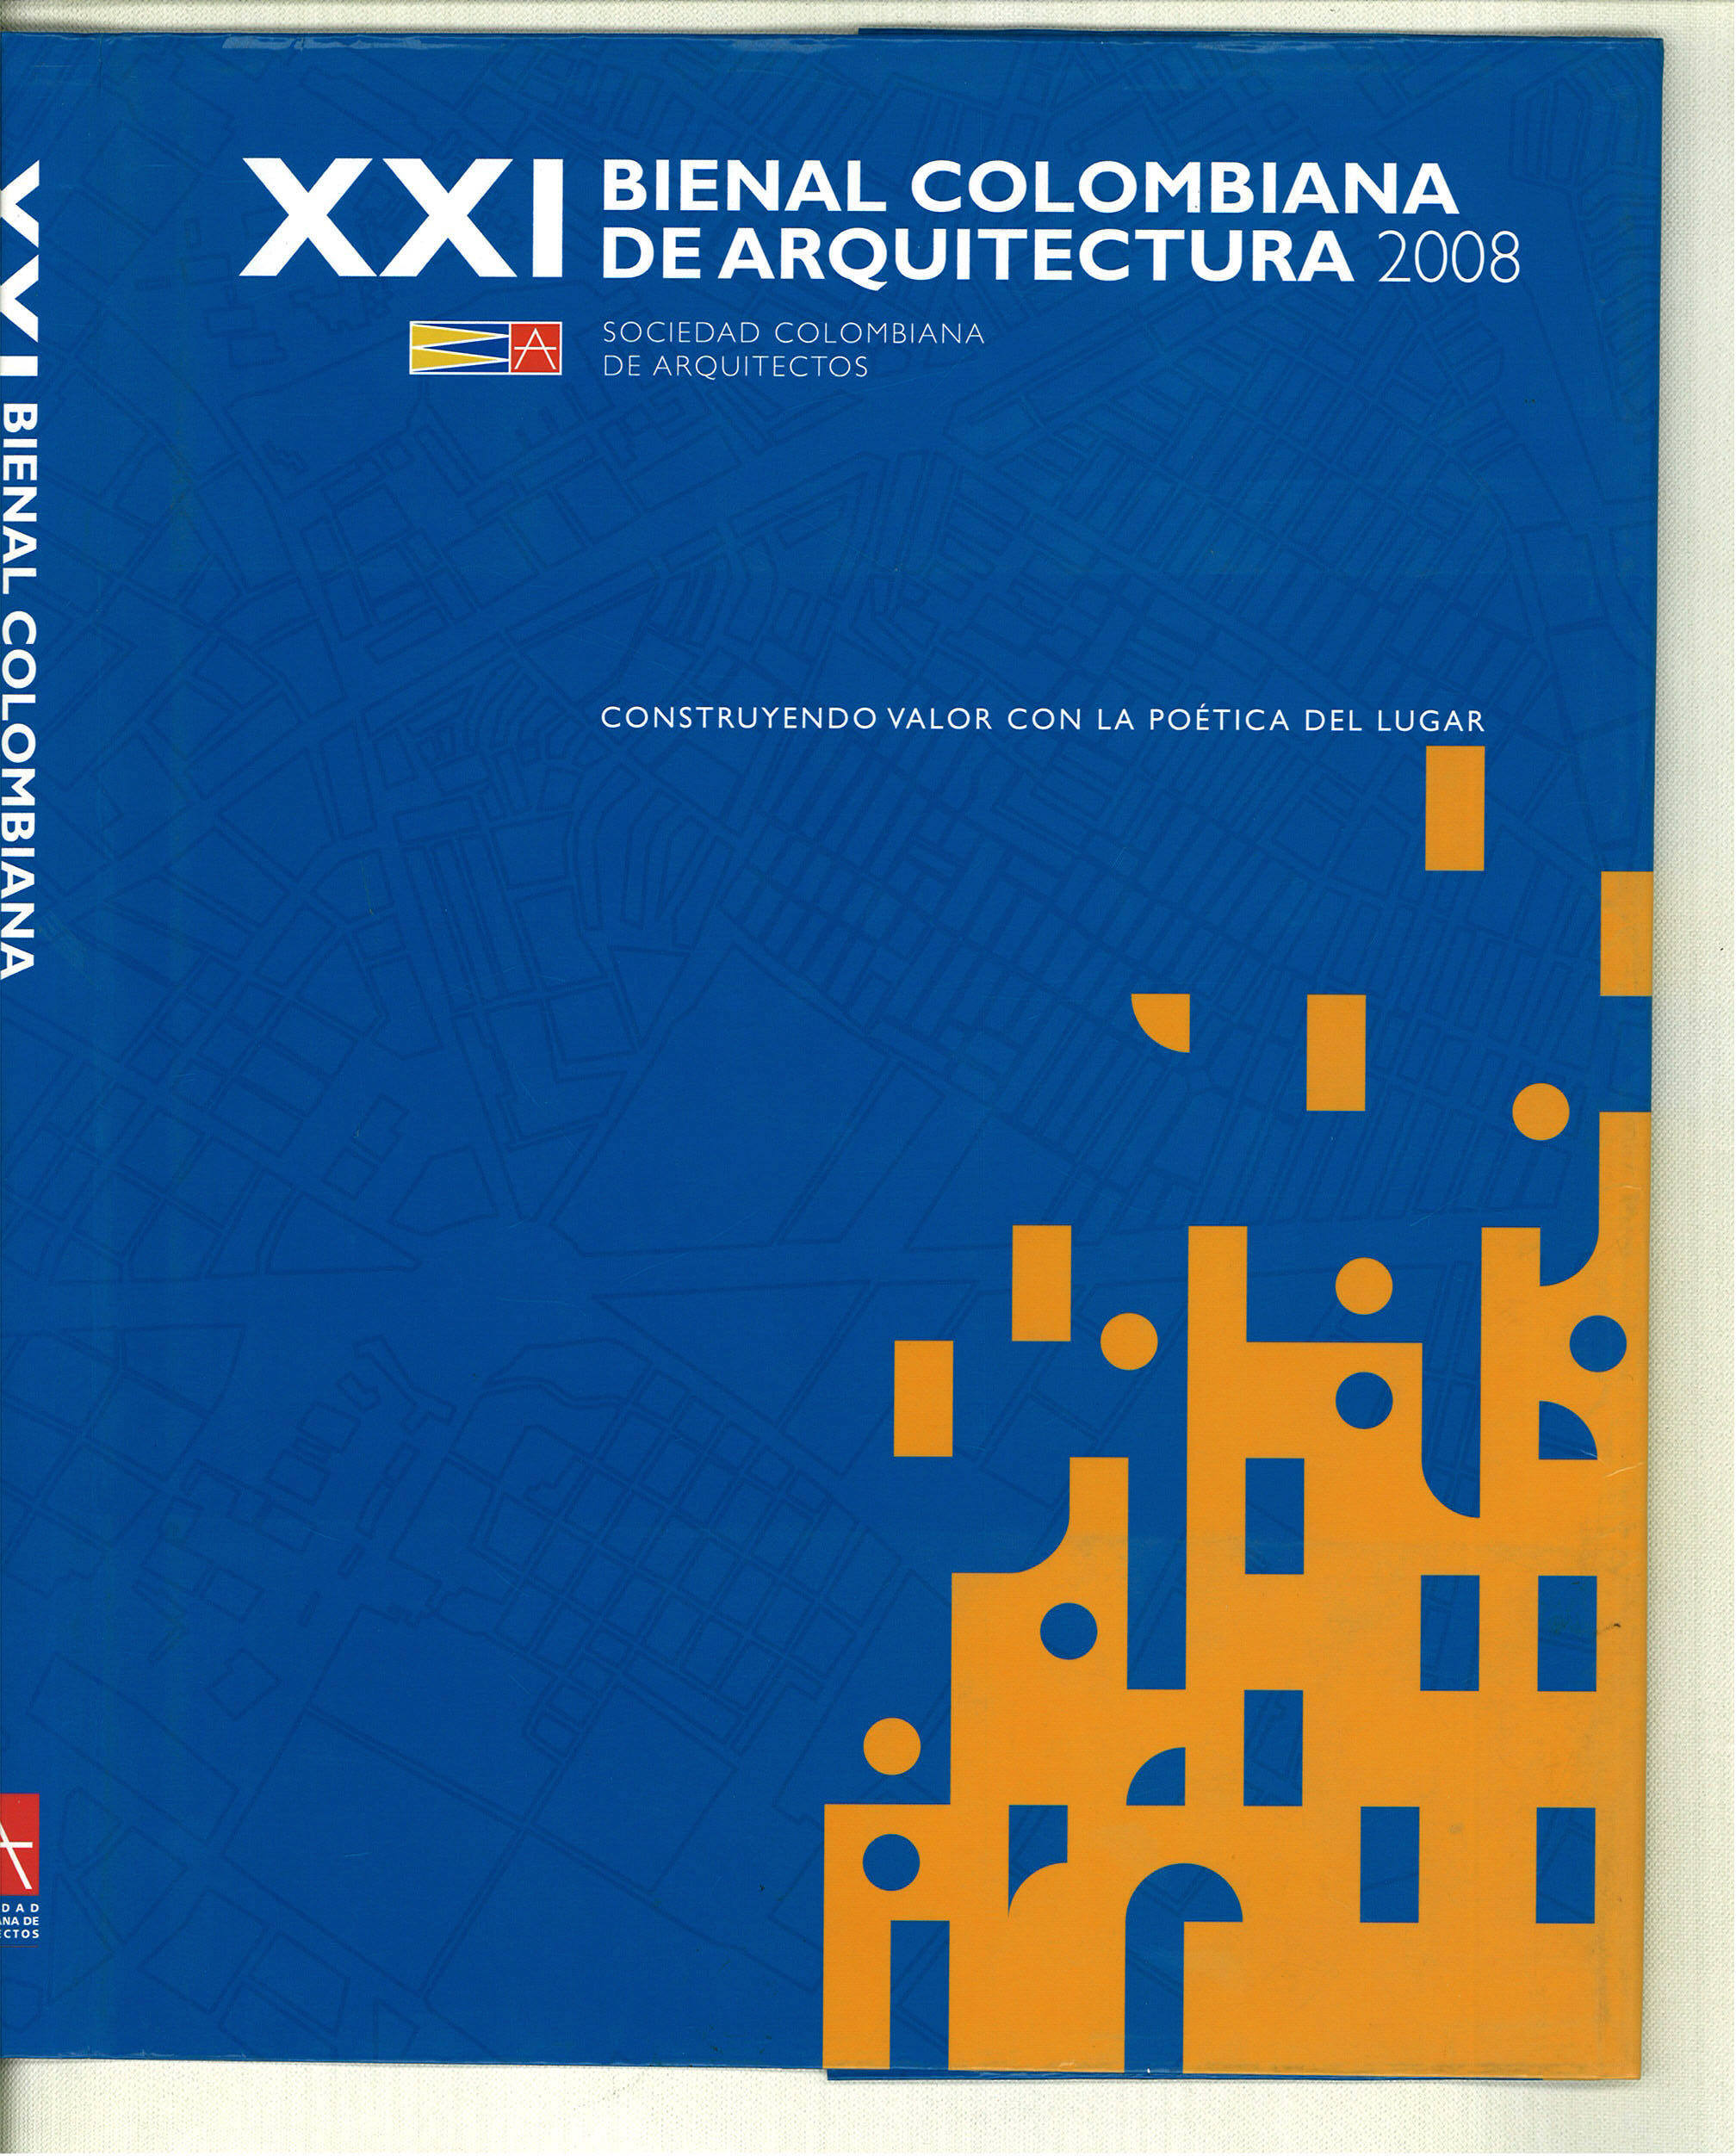 Bienal 2008 Book